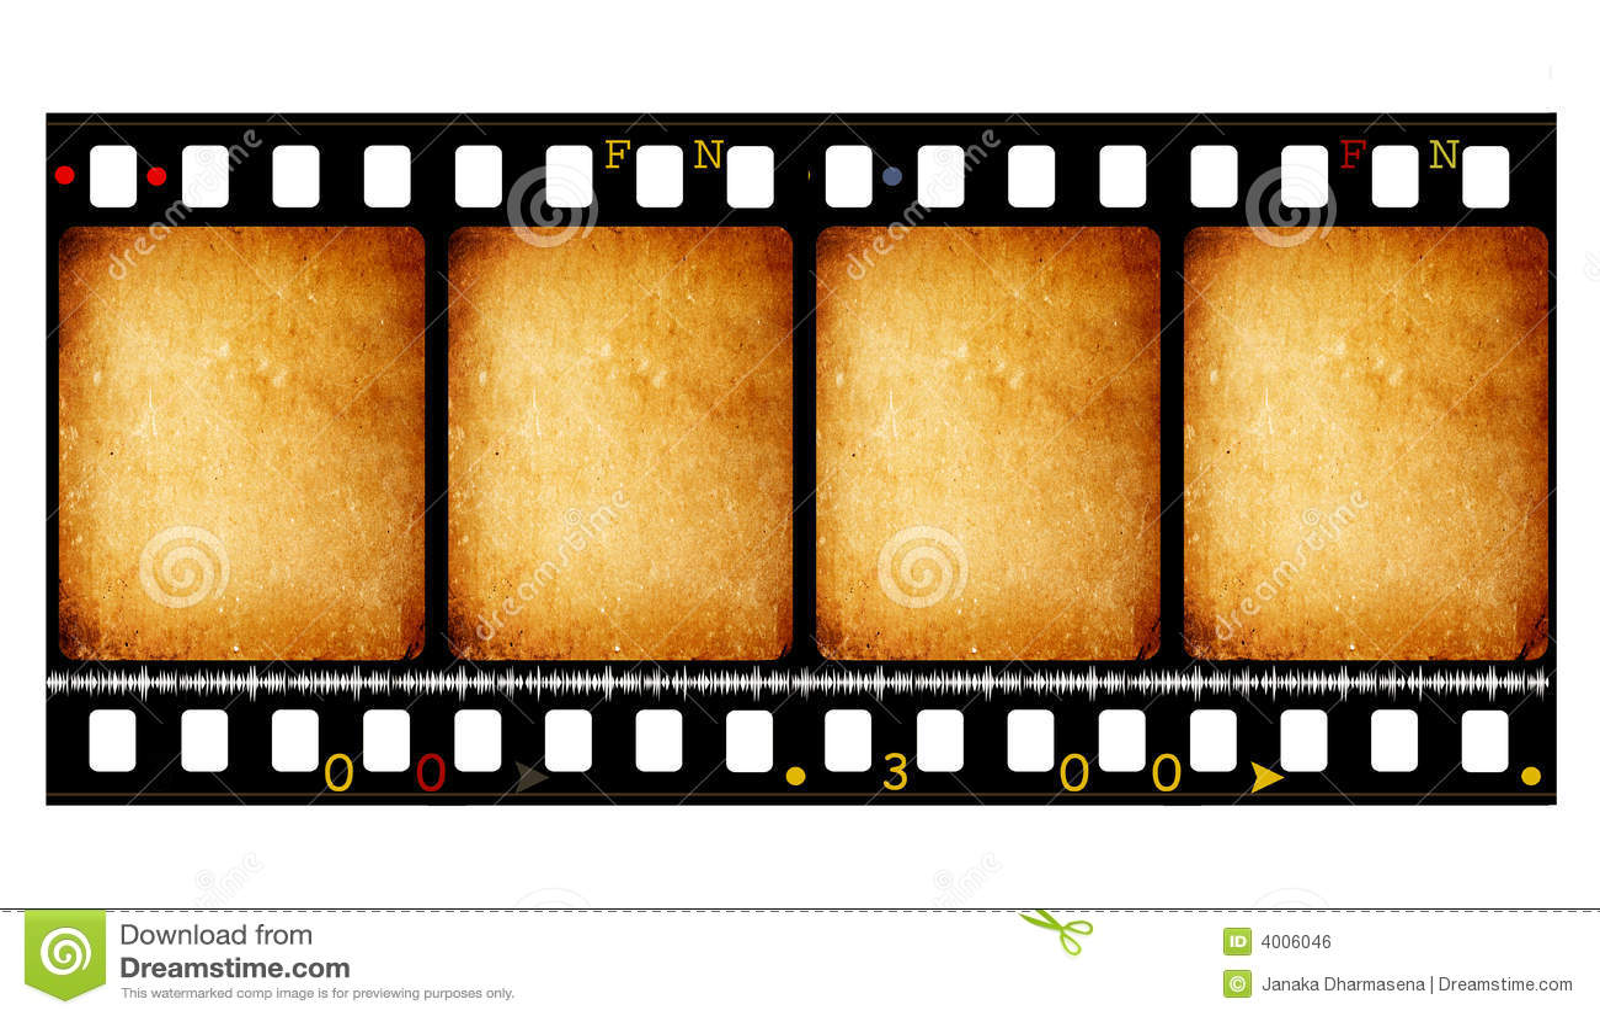 Bobine de film de film de 35 millimètres